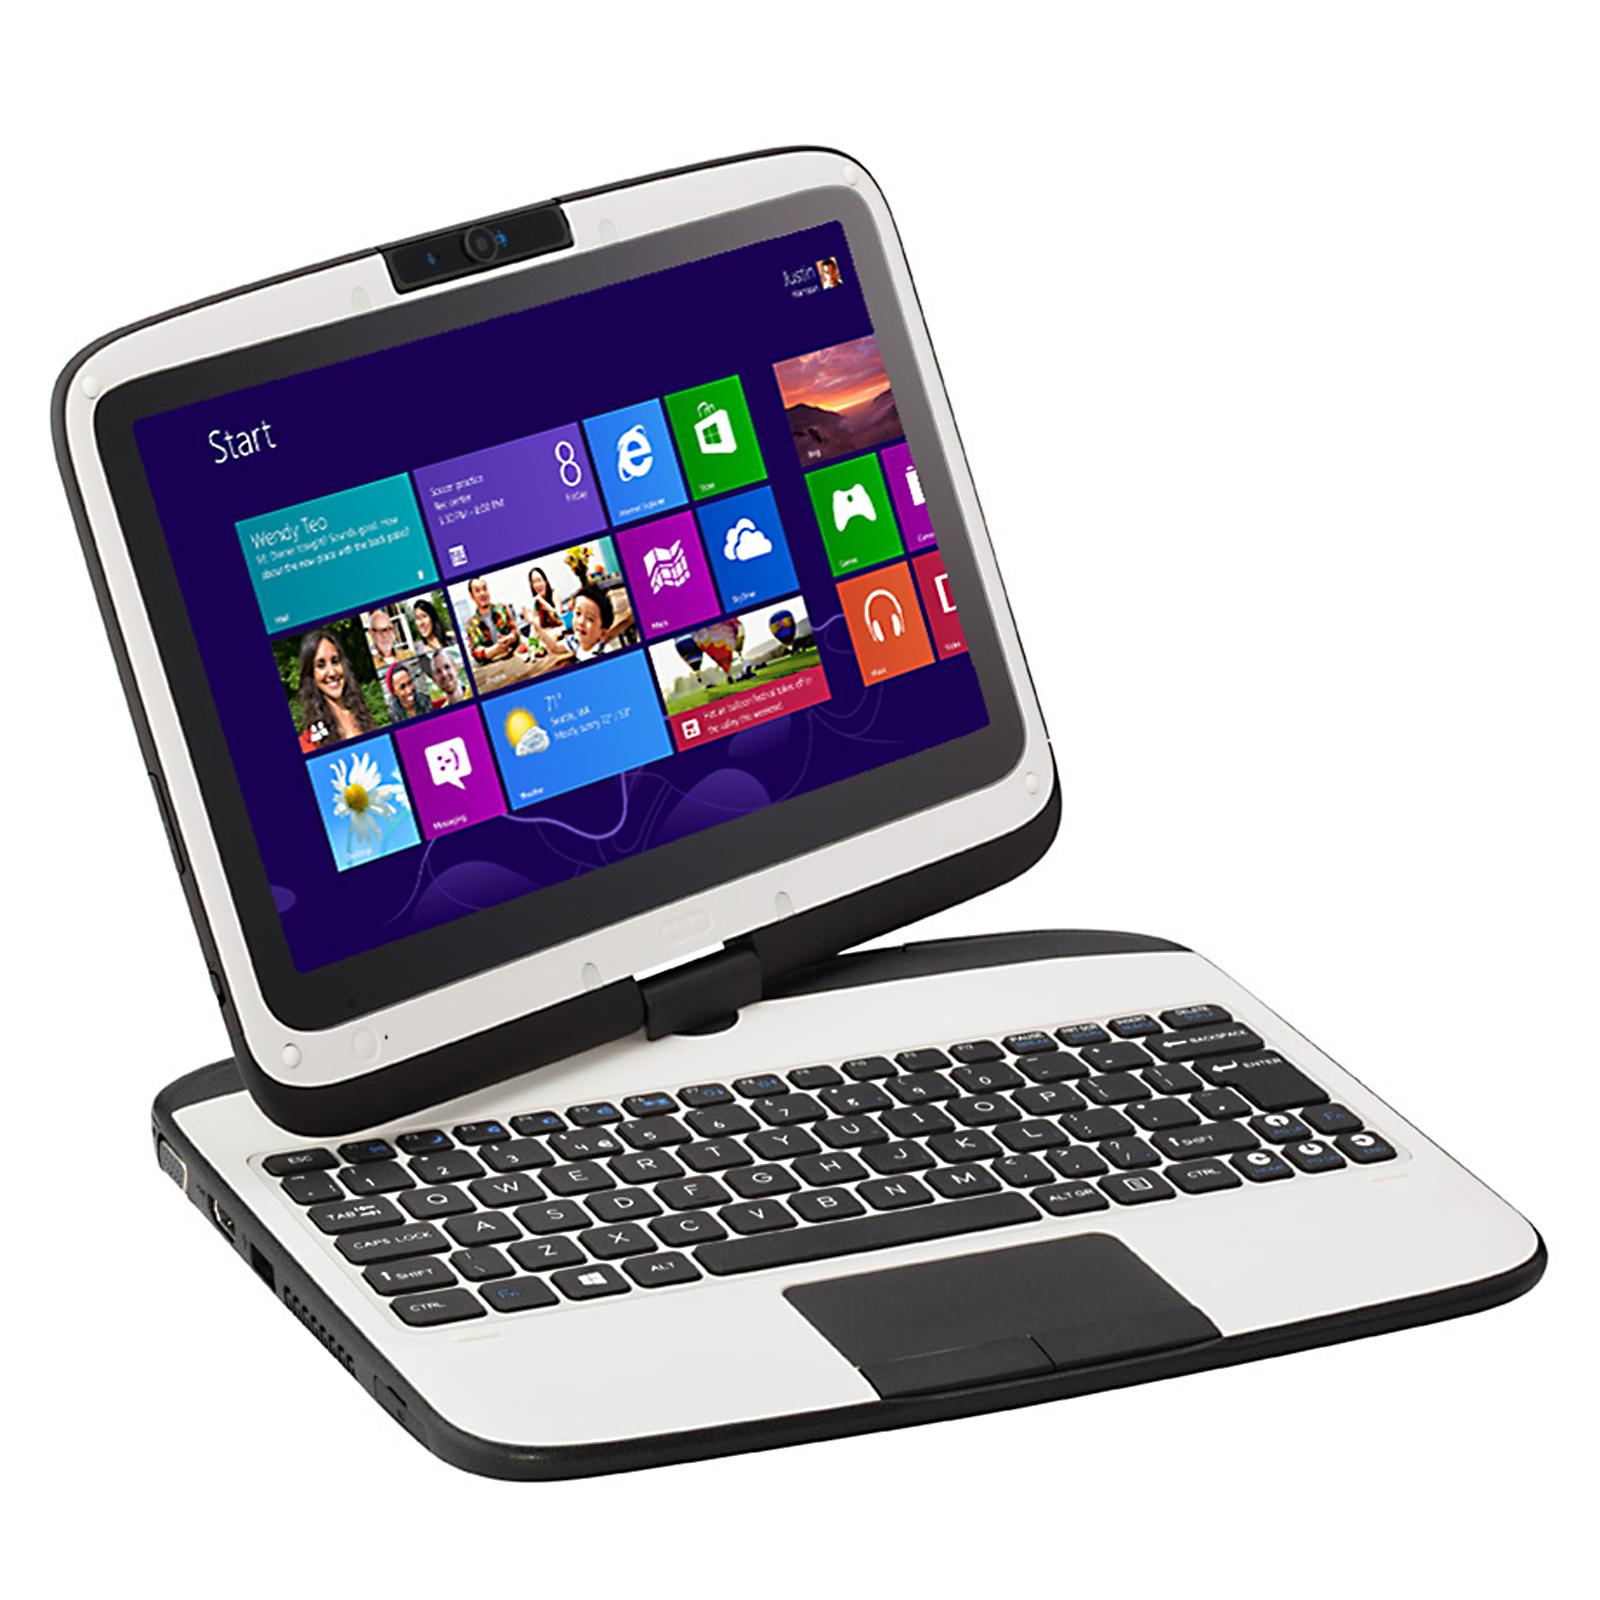 Netbooks: Buy Netbooks In TVs & Electronics at Kmart